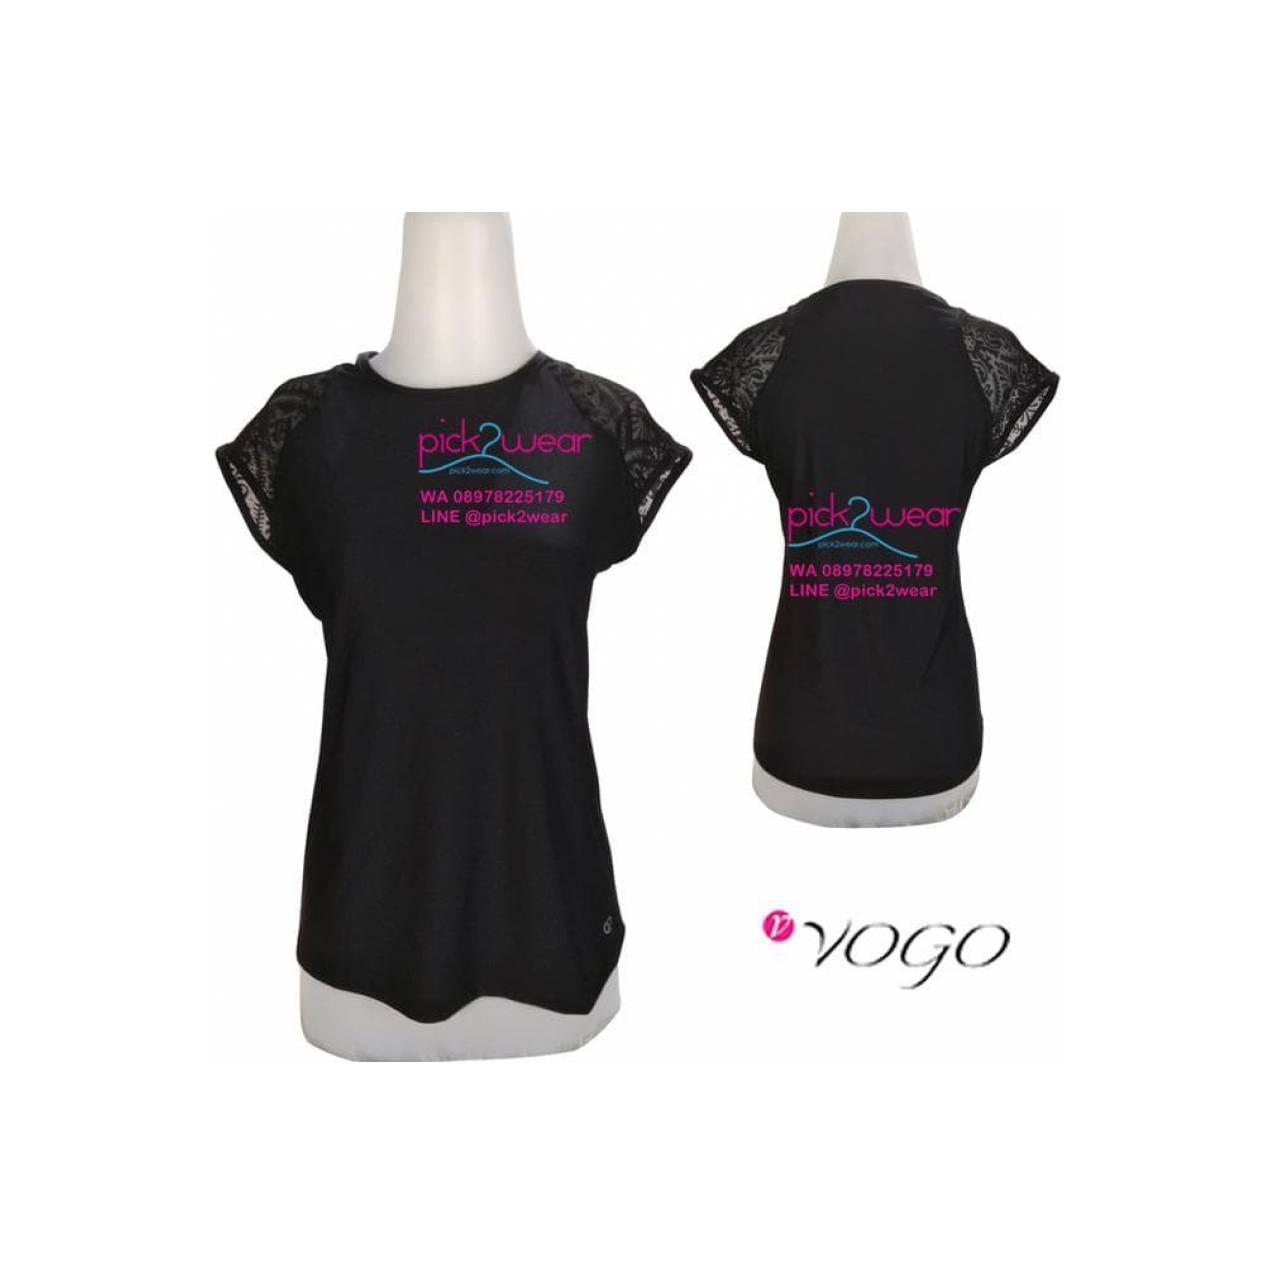 Jual Kaos Sport / Senam / Fitness / Zumba / Yoga Black Promo